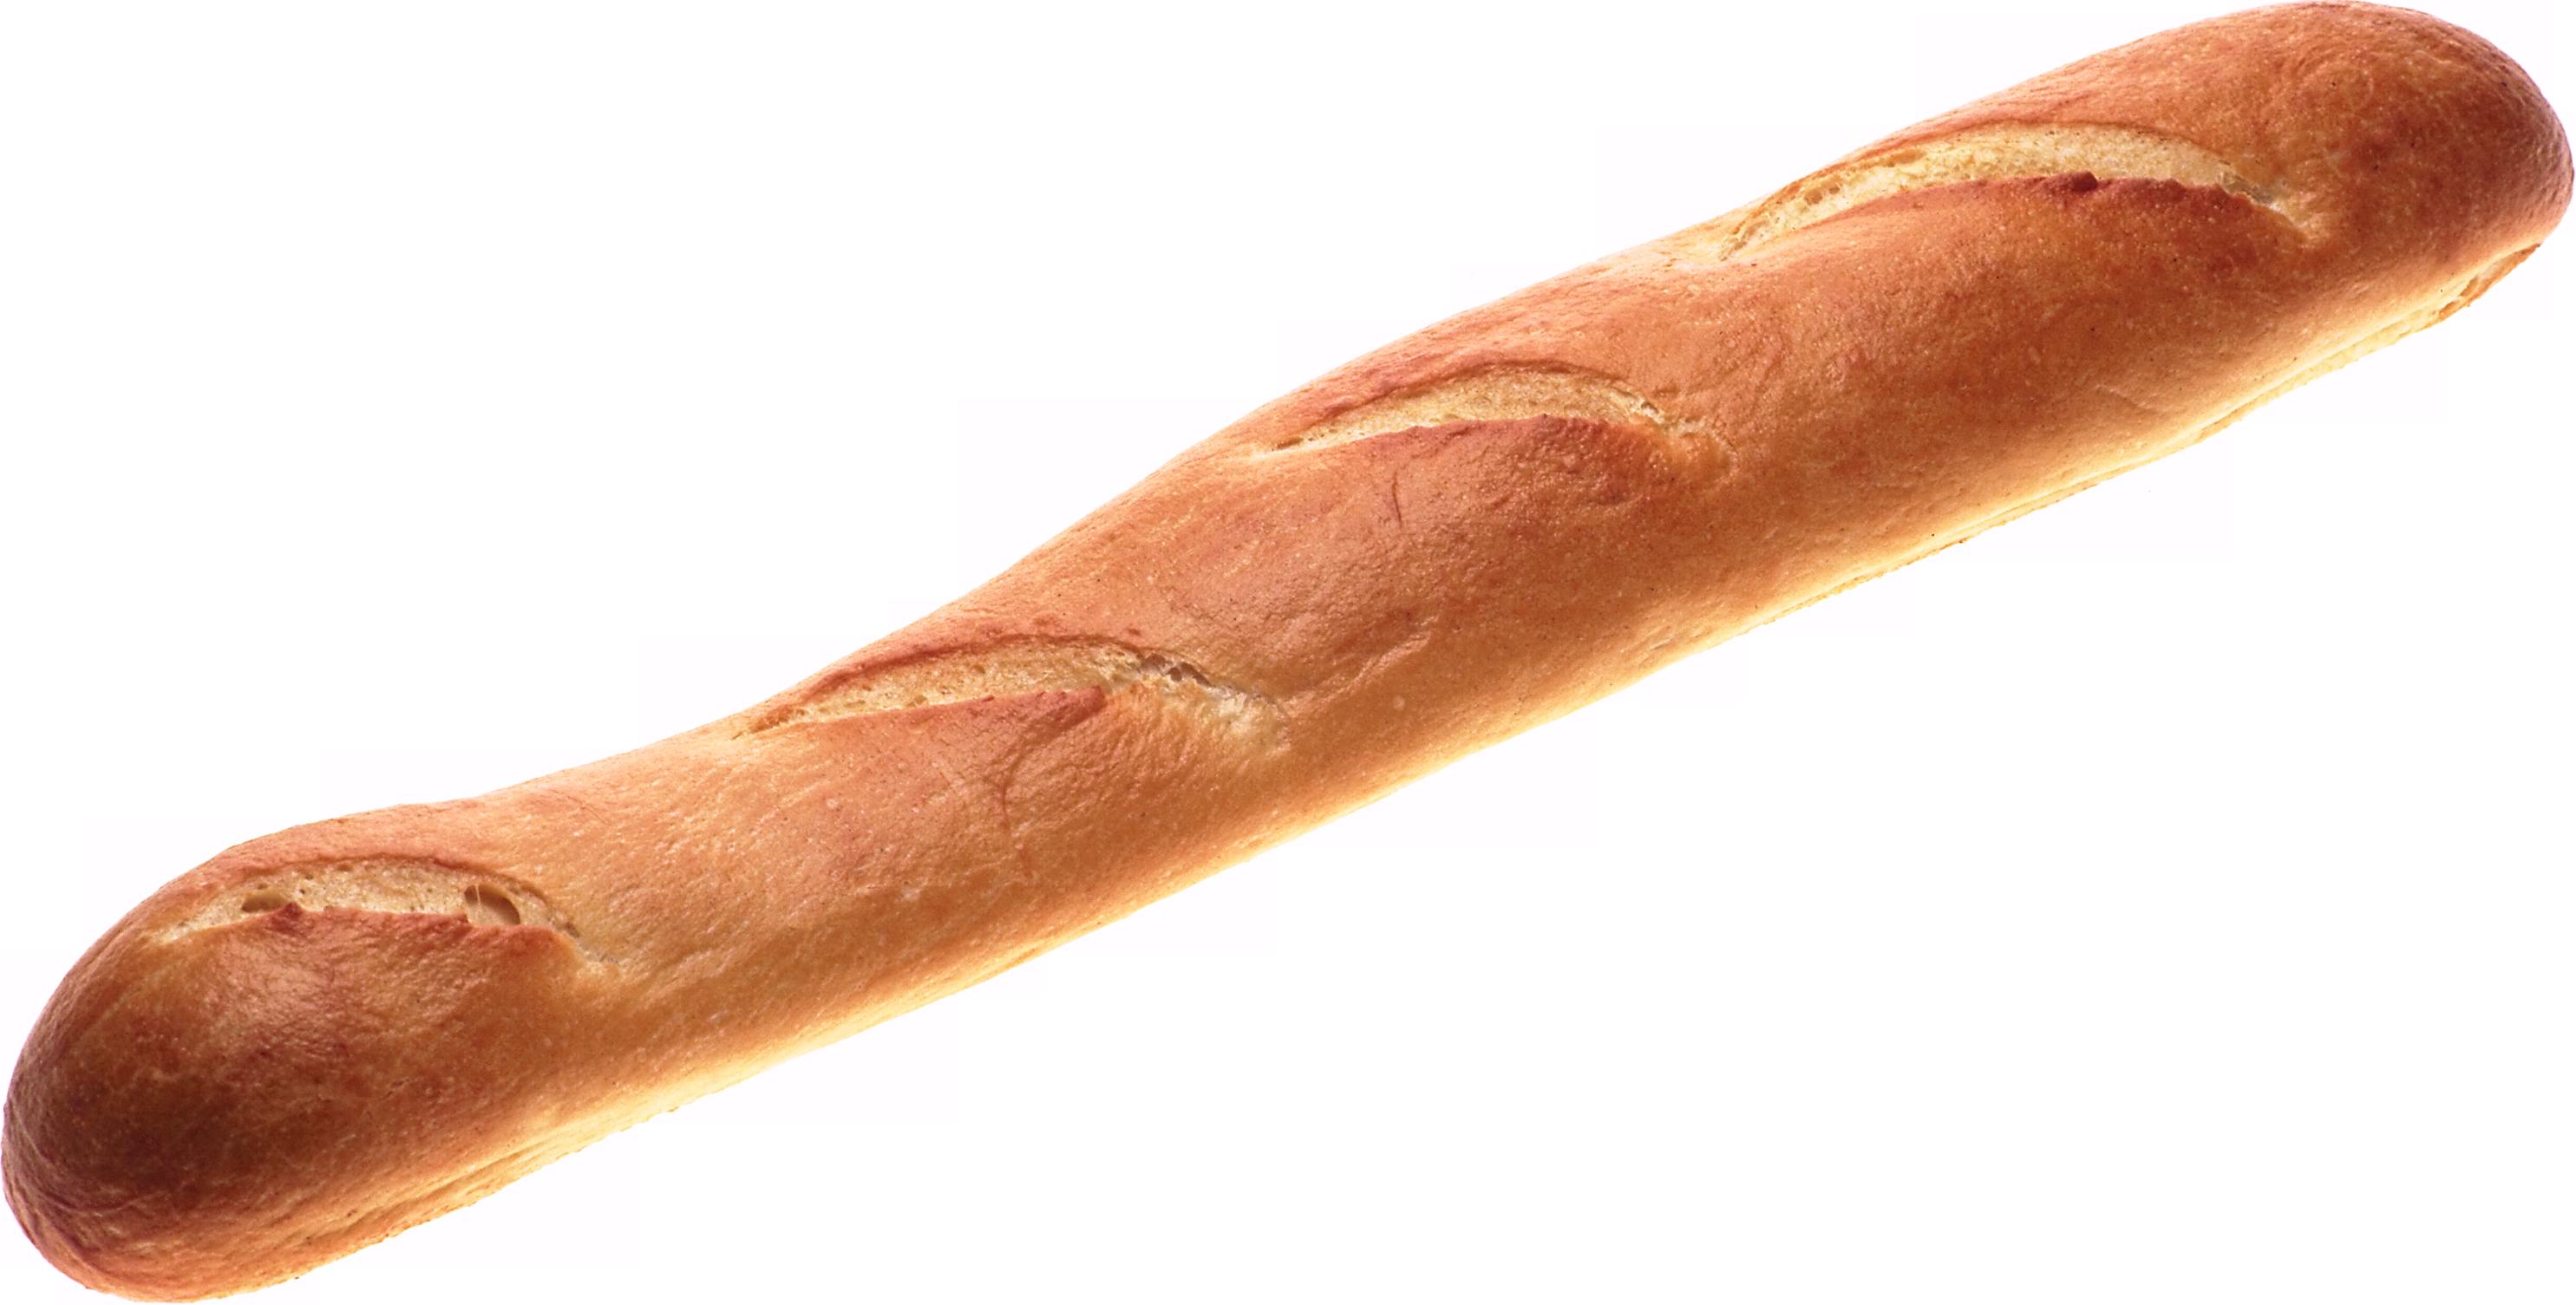 Baguette PNG Image